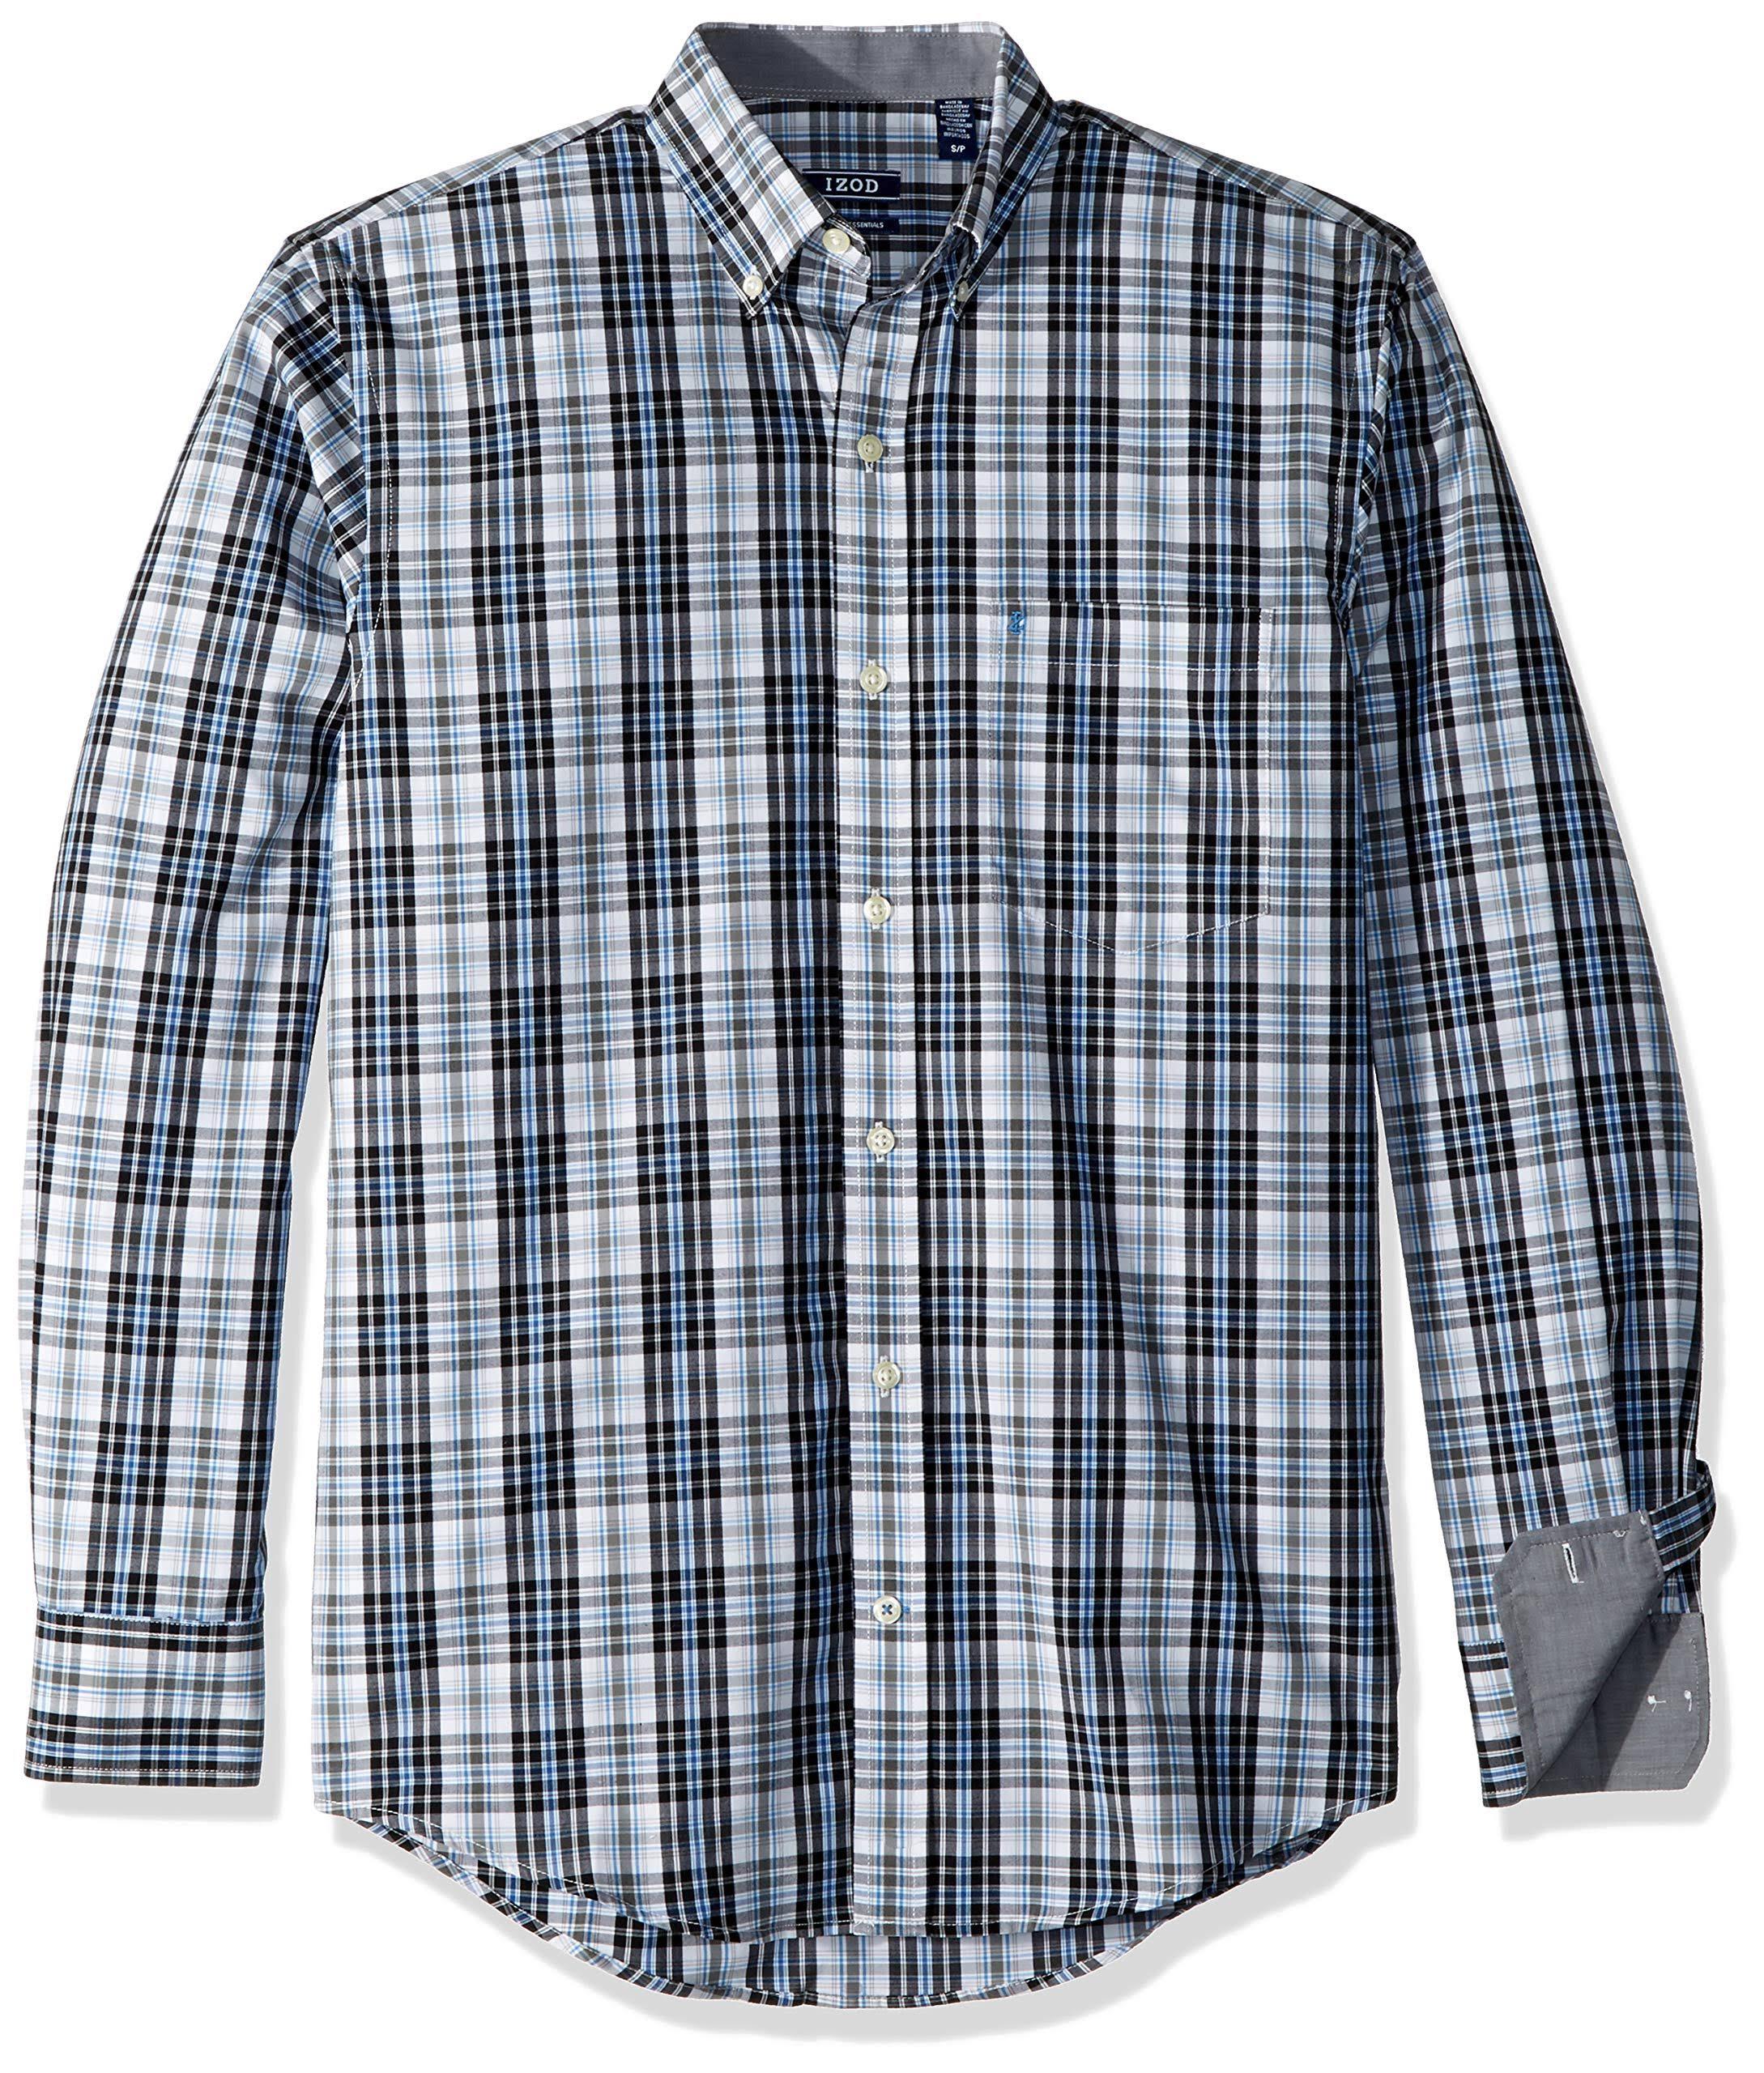 Larga A M Izod Para De Hombre Cuadros Camisa Manga Elástico Negro PBXqZCndn